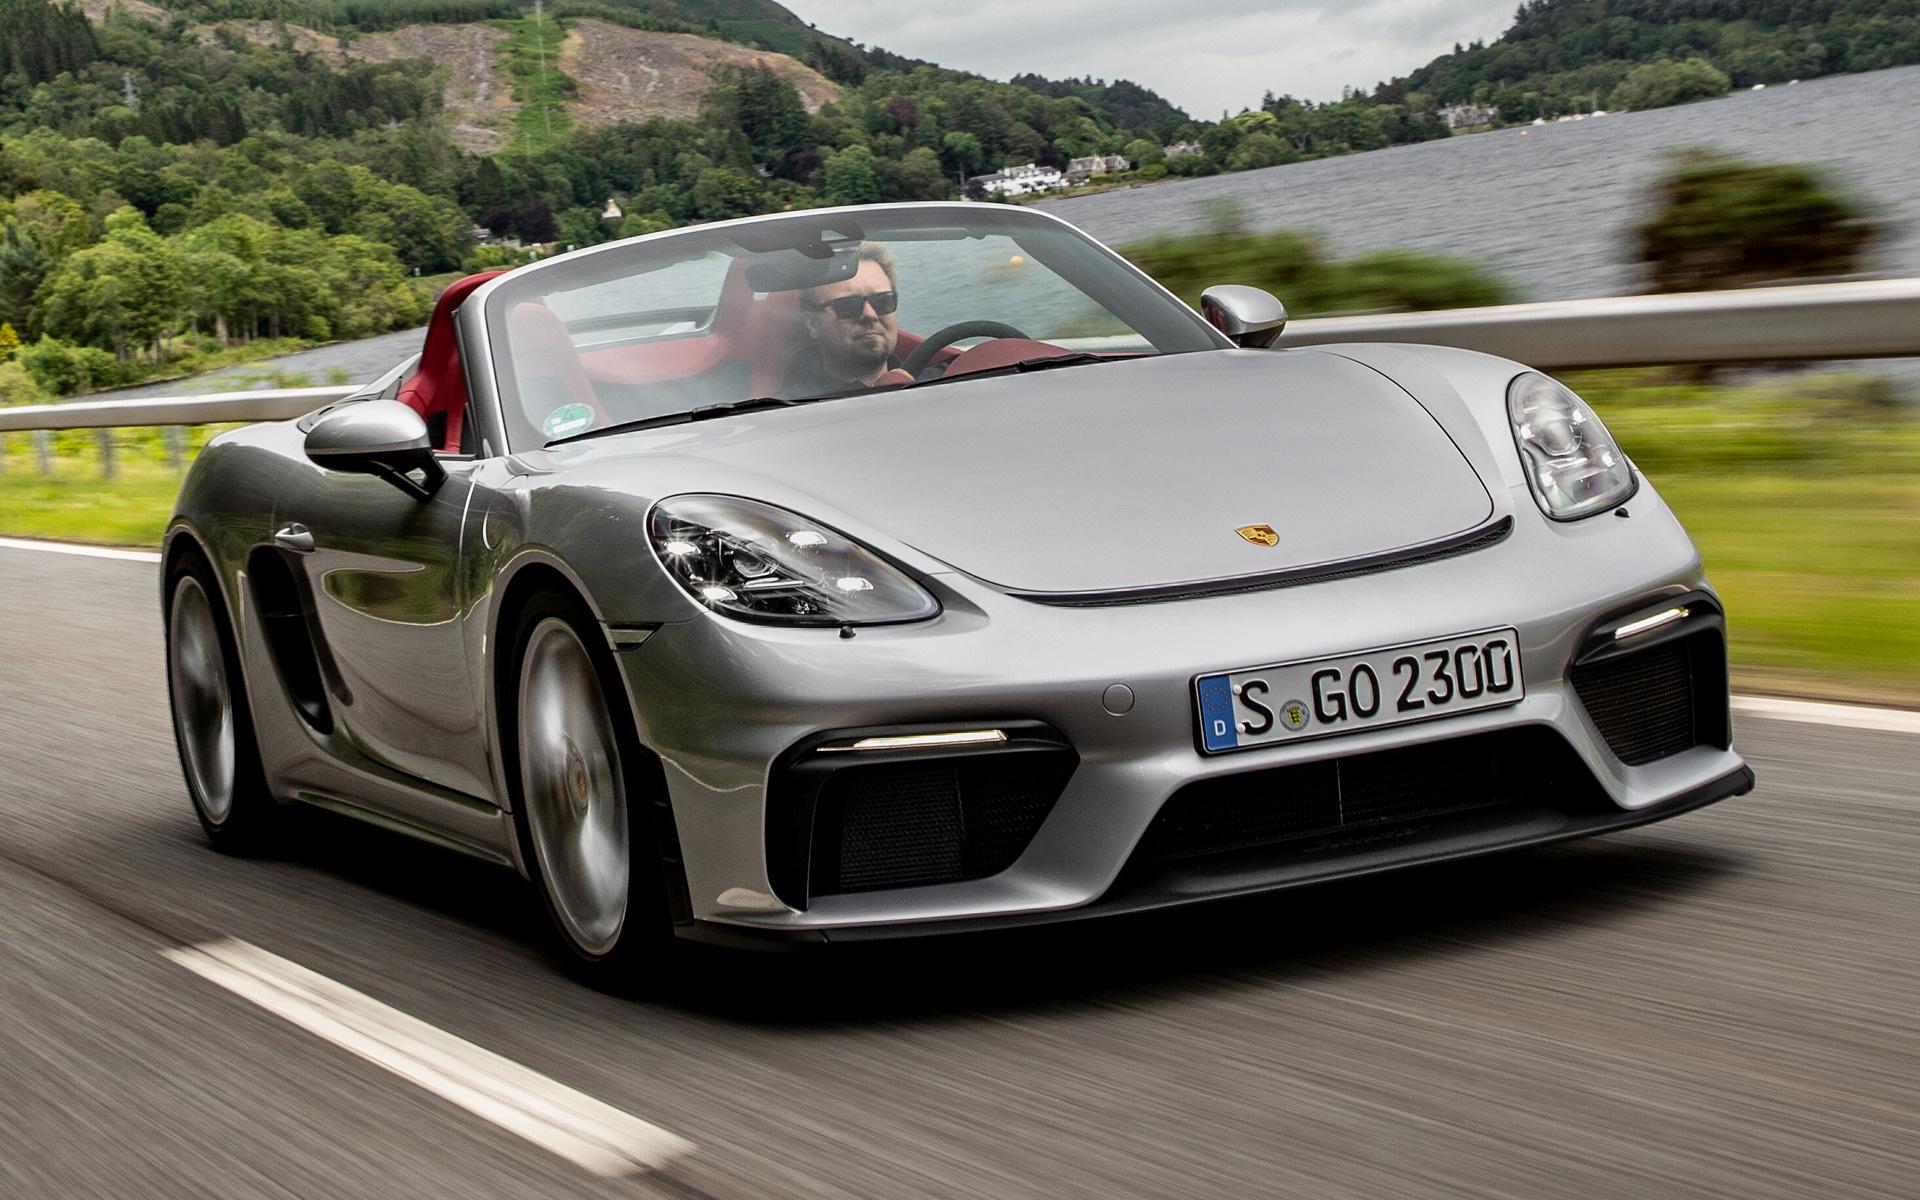 2019 Porsche 718 Spyder Wallpapers And Hd Images Car Pixel